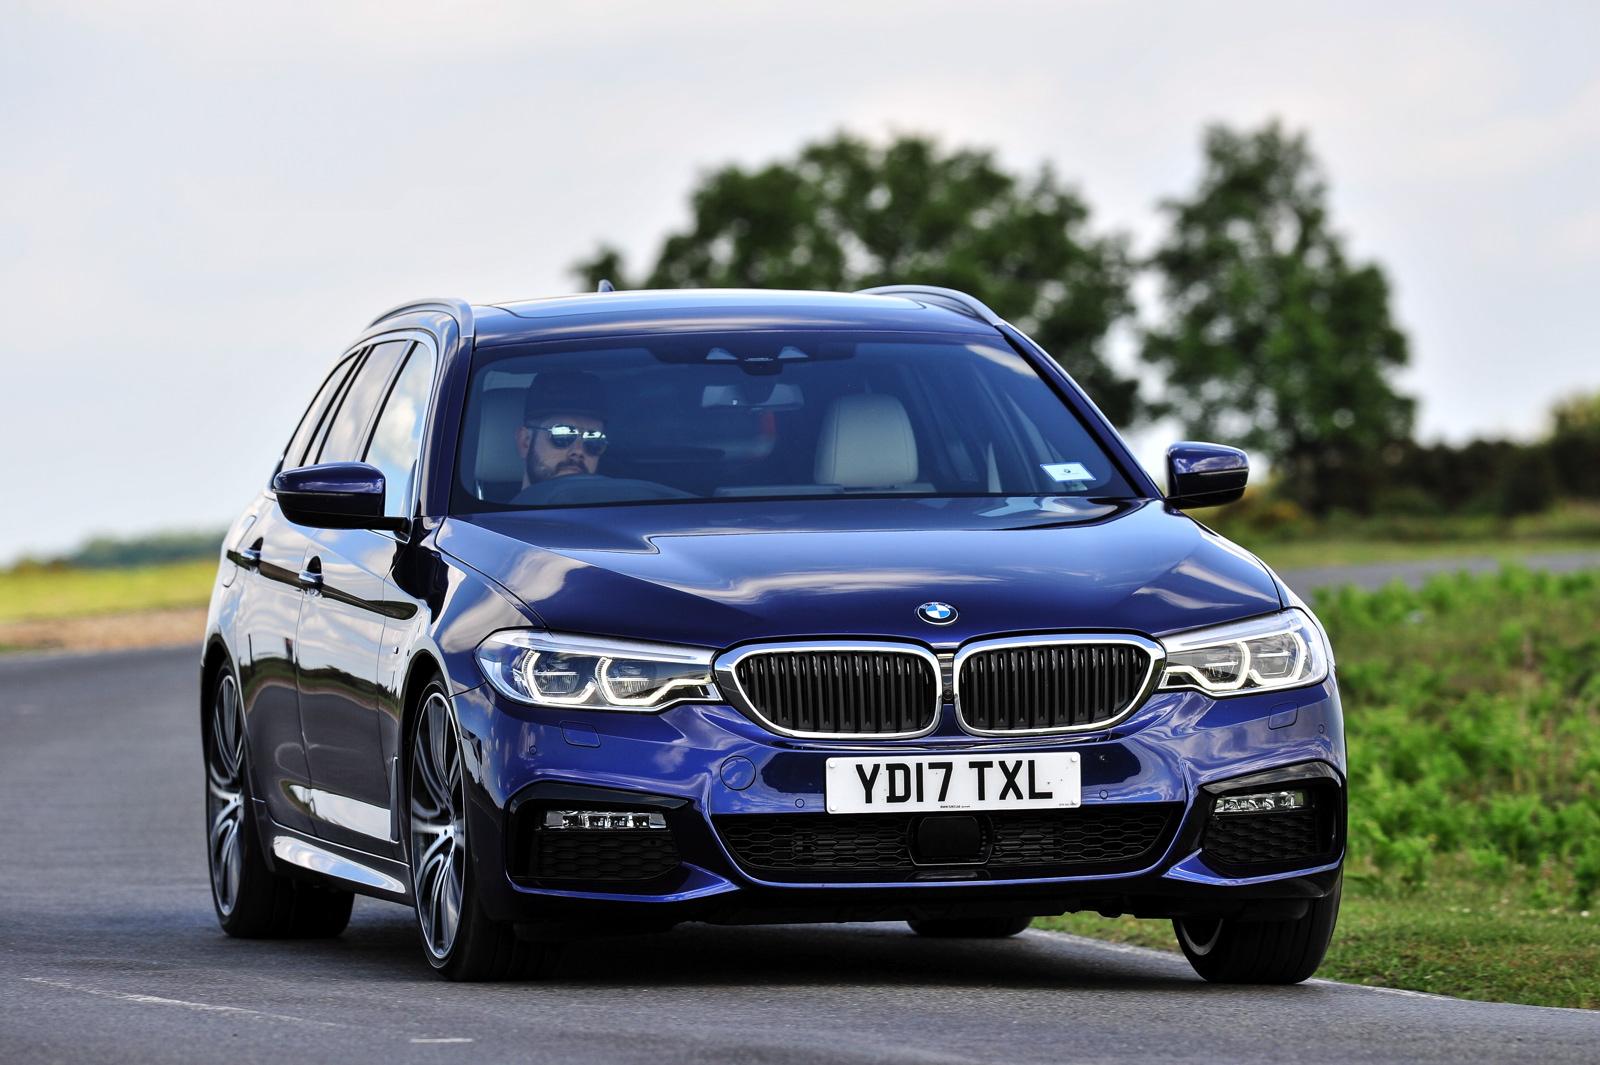 2017 BMW 5 Series Touring England 90